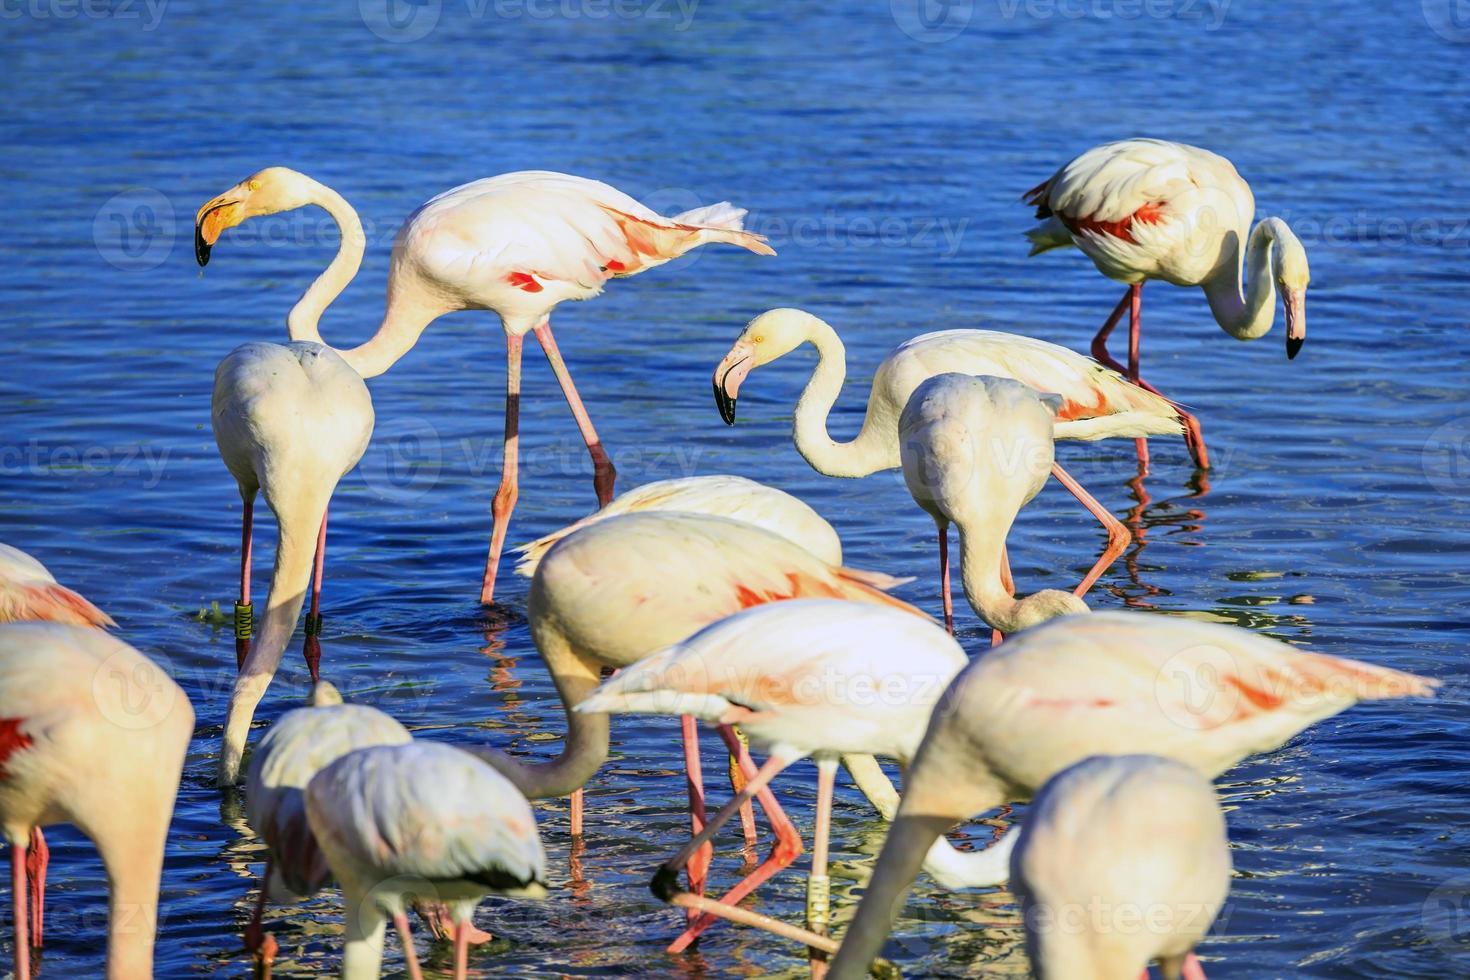 Pack of pink flamingos photo